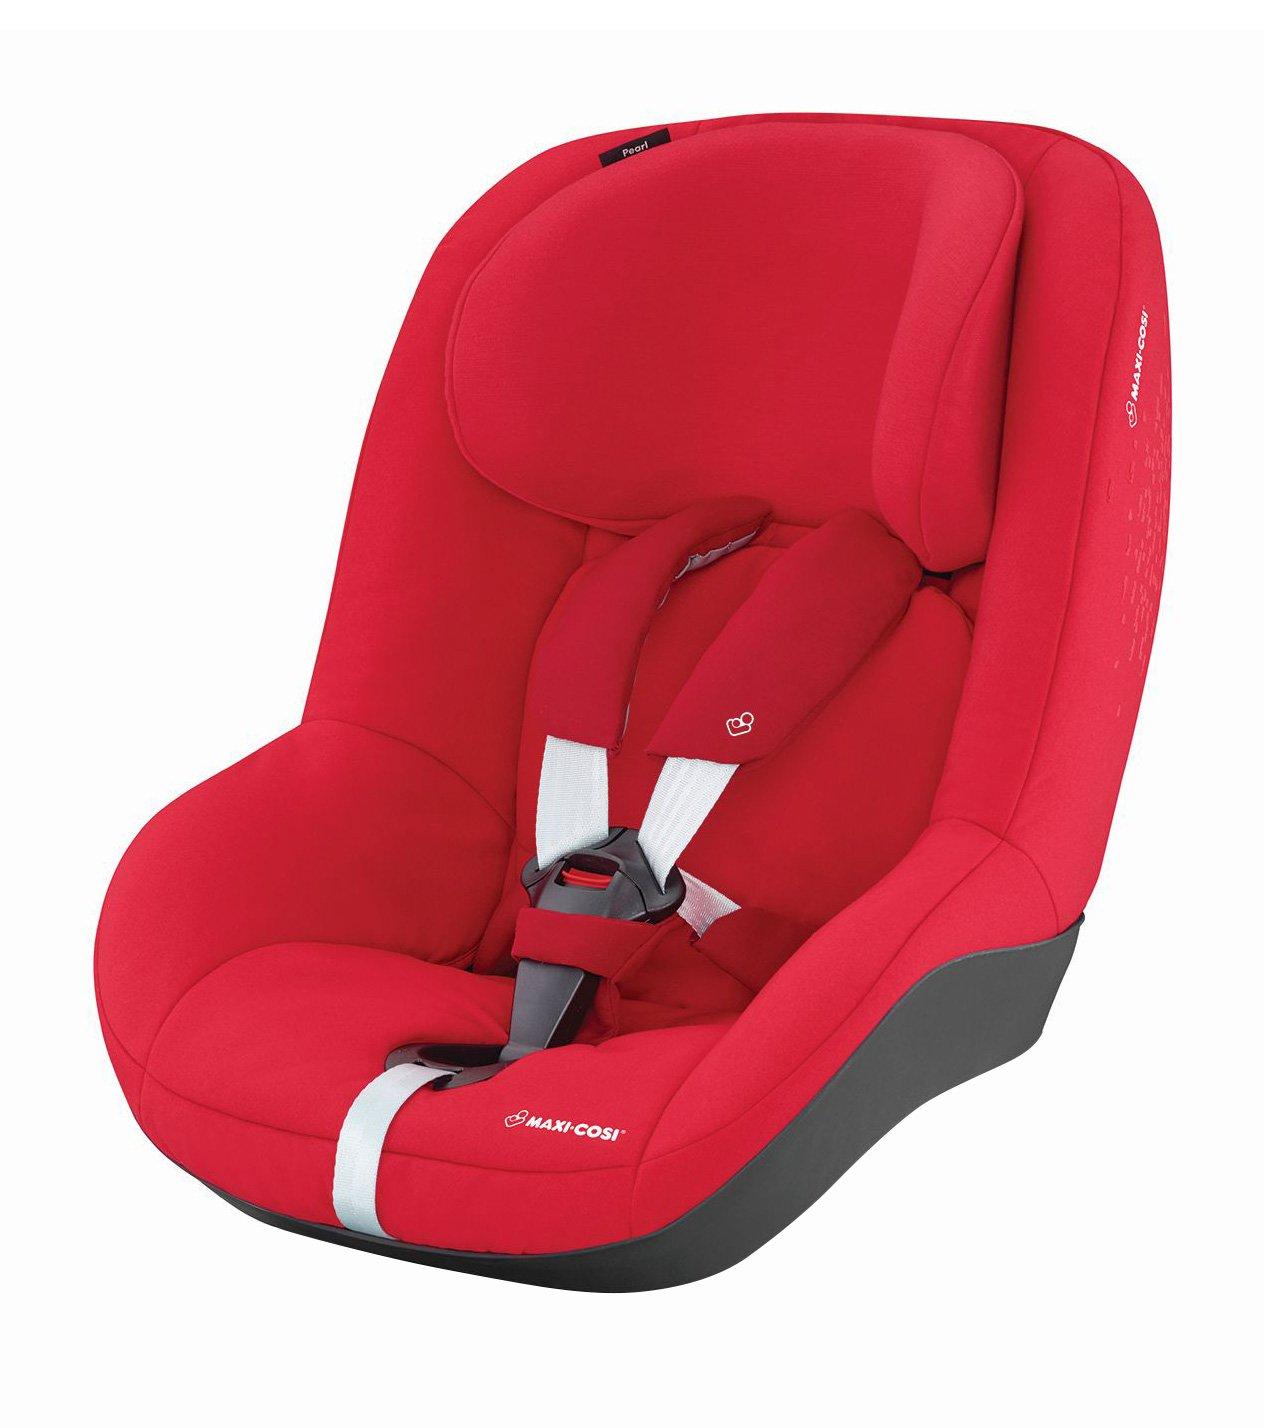 Bērnu autosēdeklis 9-18 kg MAXI-COSI Pearl Vivid Red